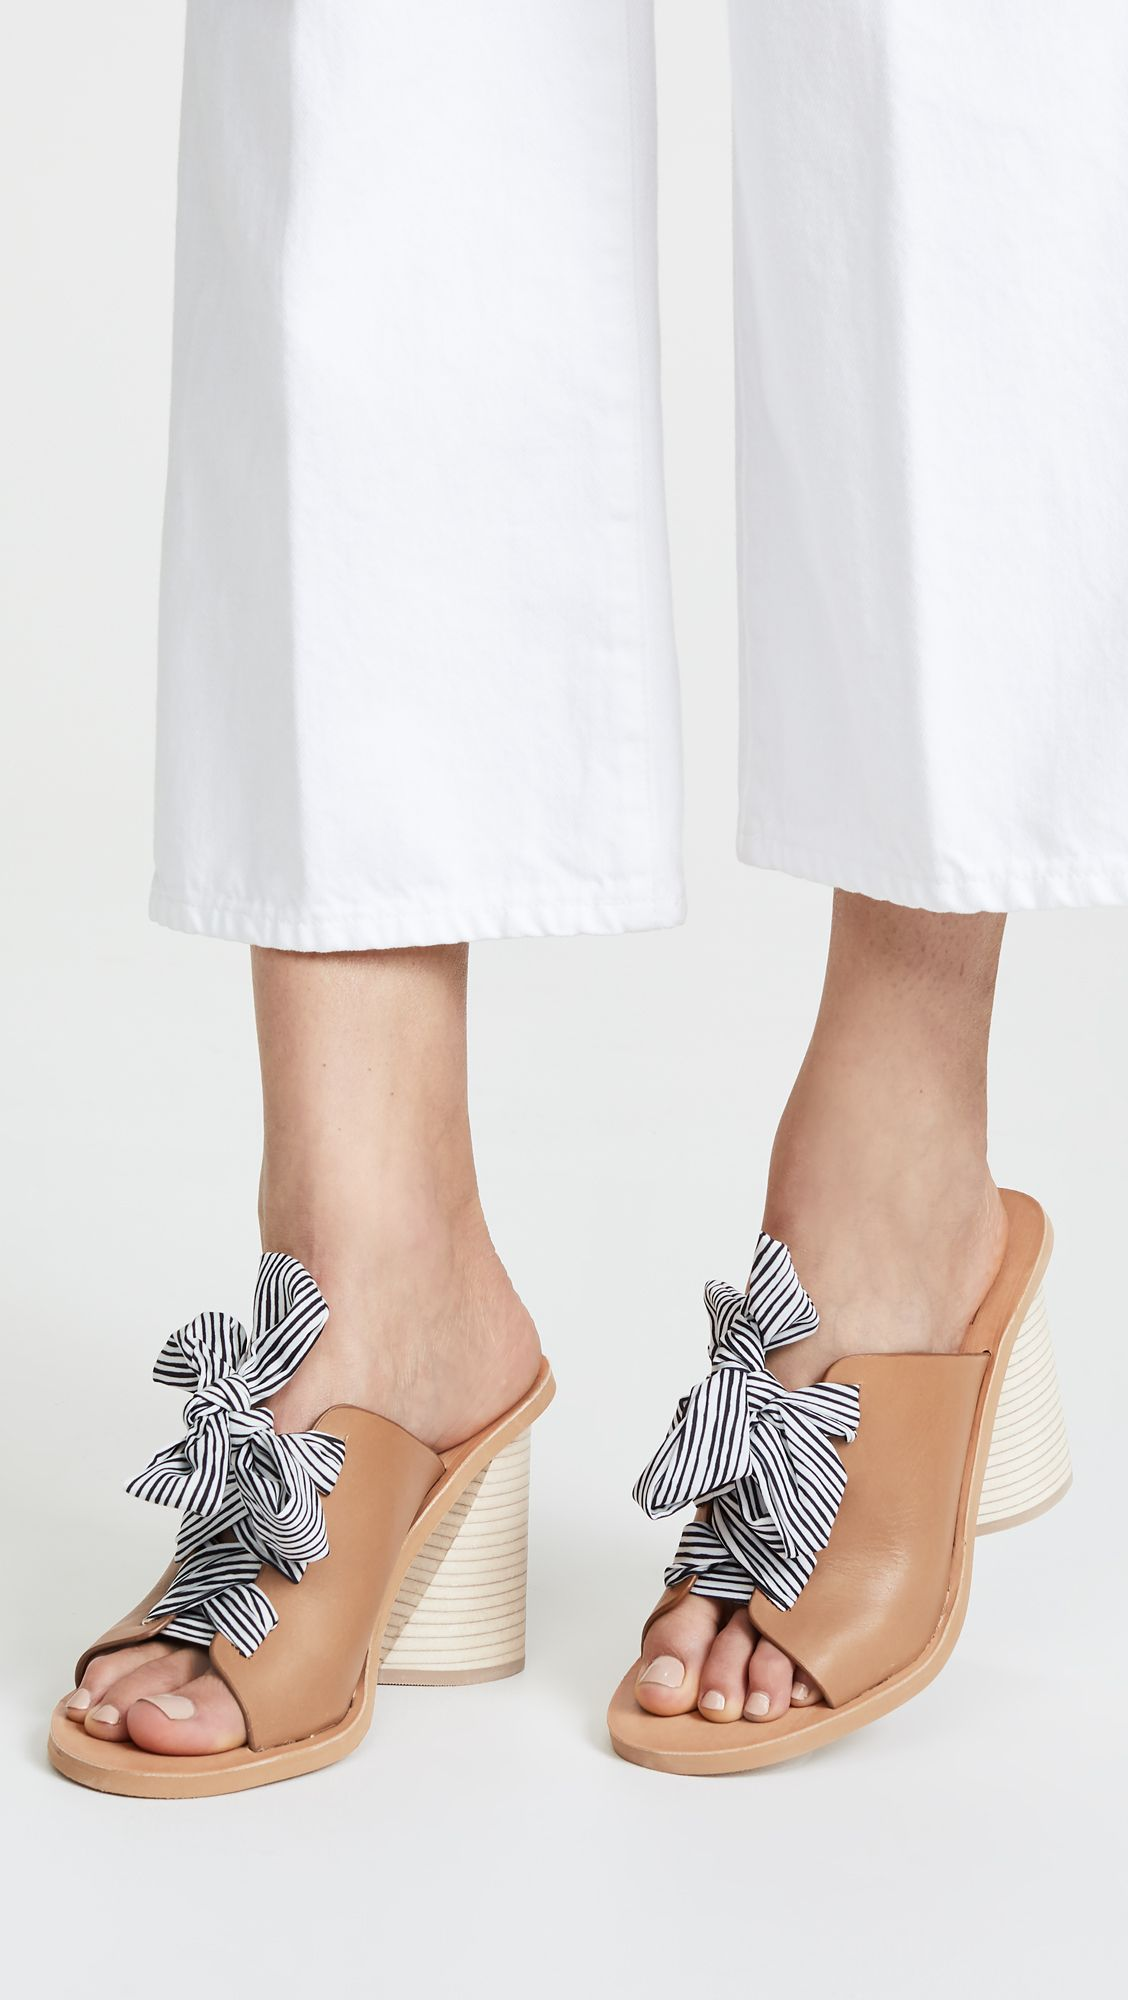 bc887bb1c509 Dolce Vita Amber Woven Block Heel Sandals